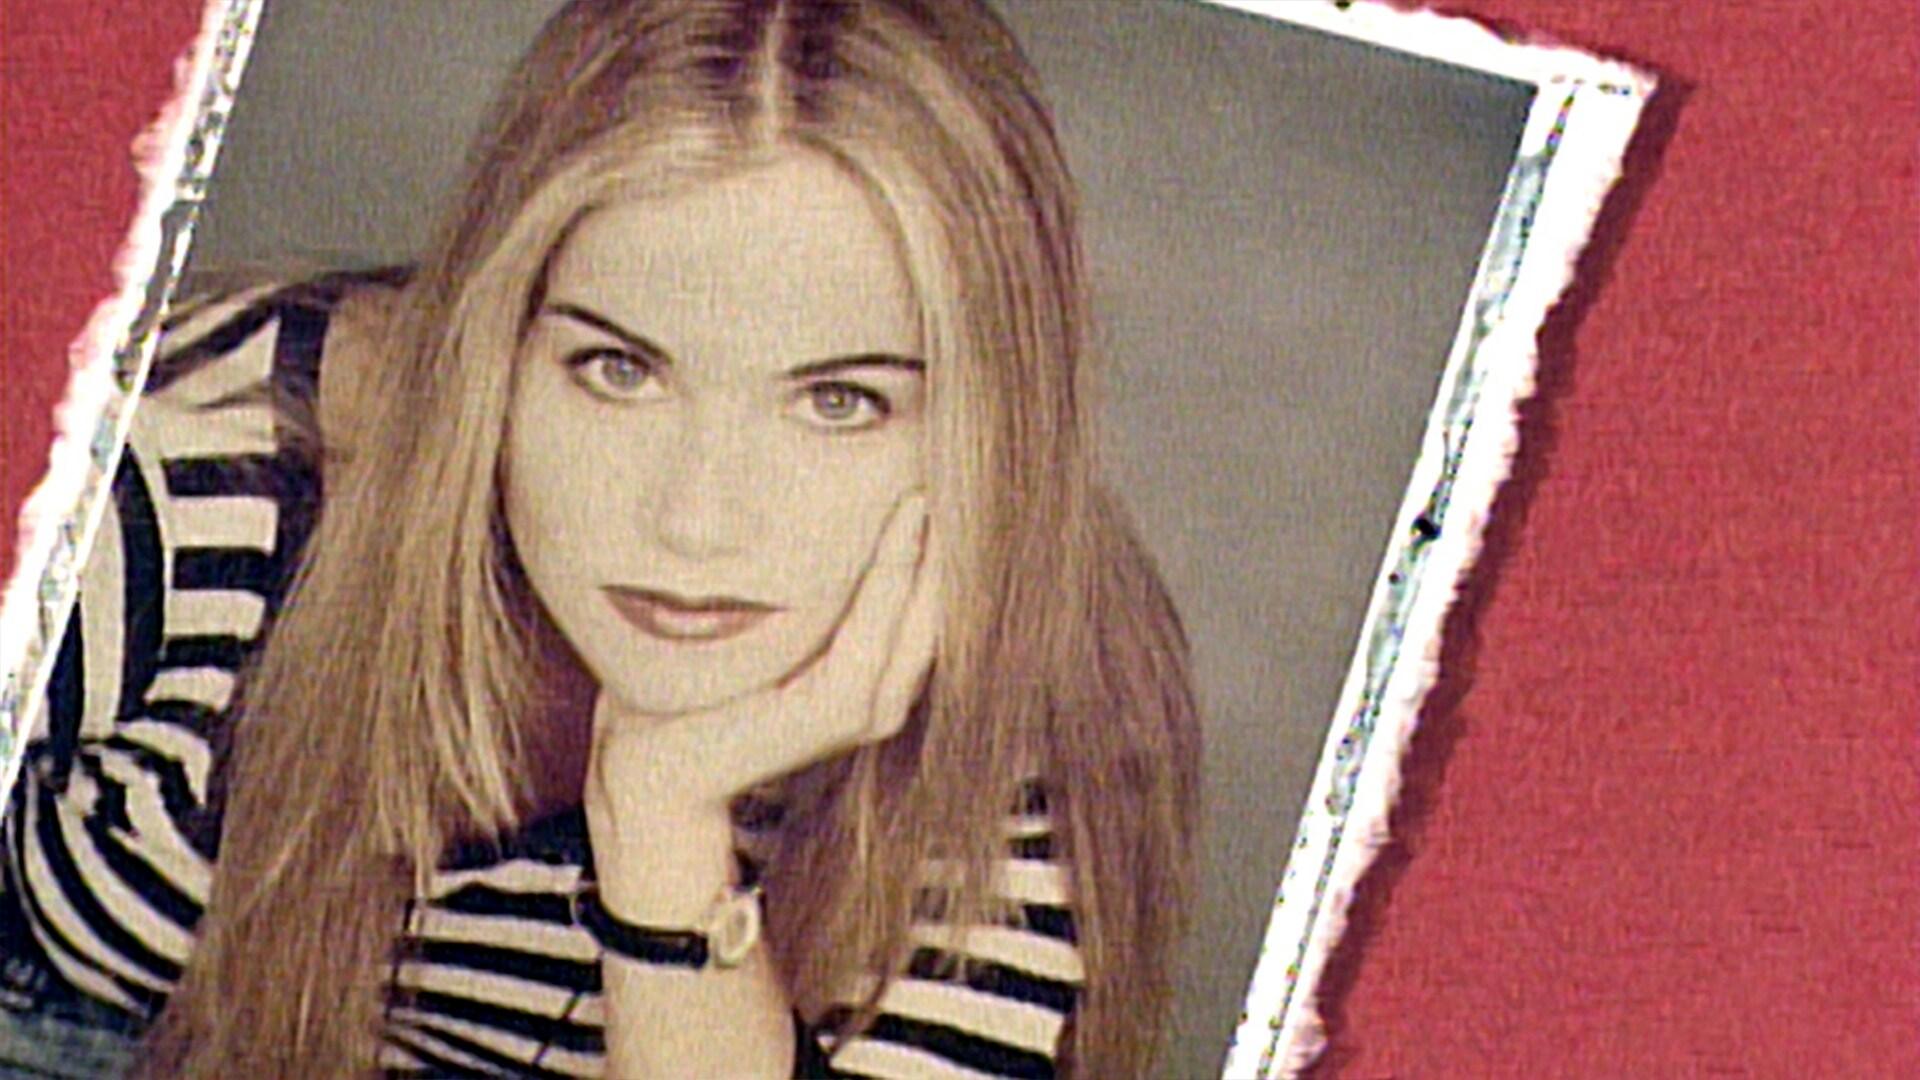 Christina Applegate: May 8, 1993